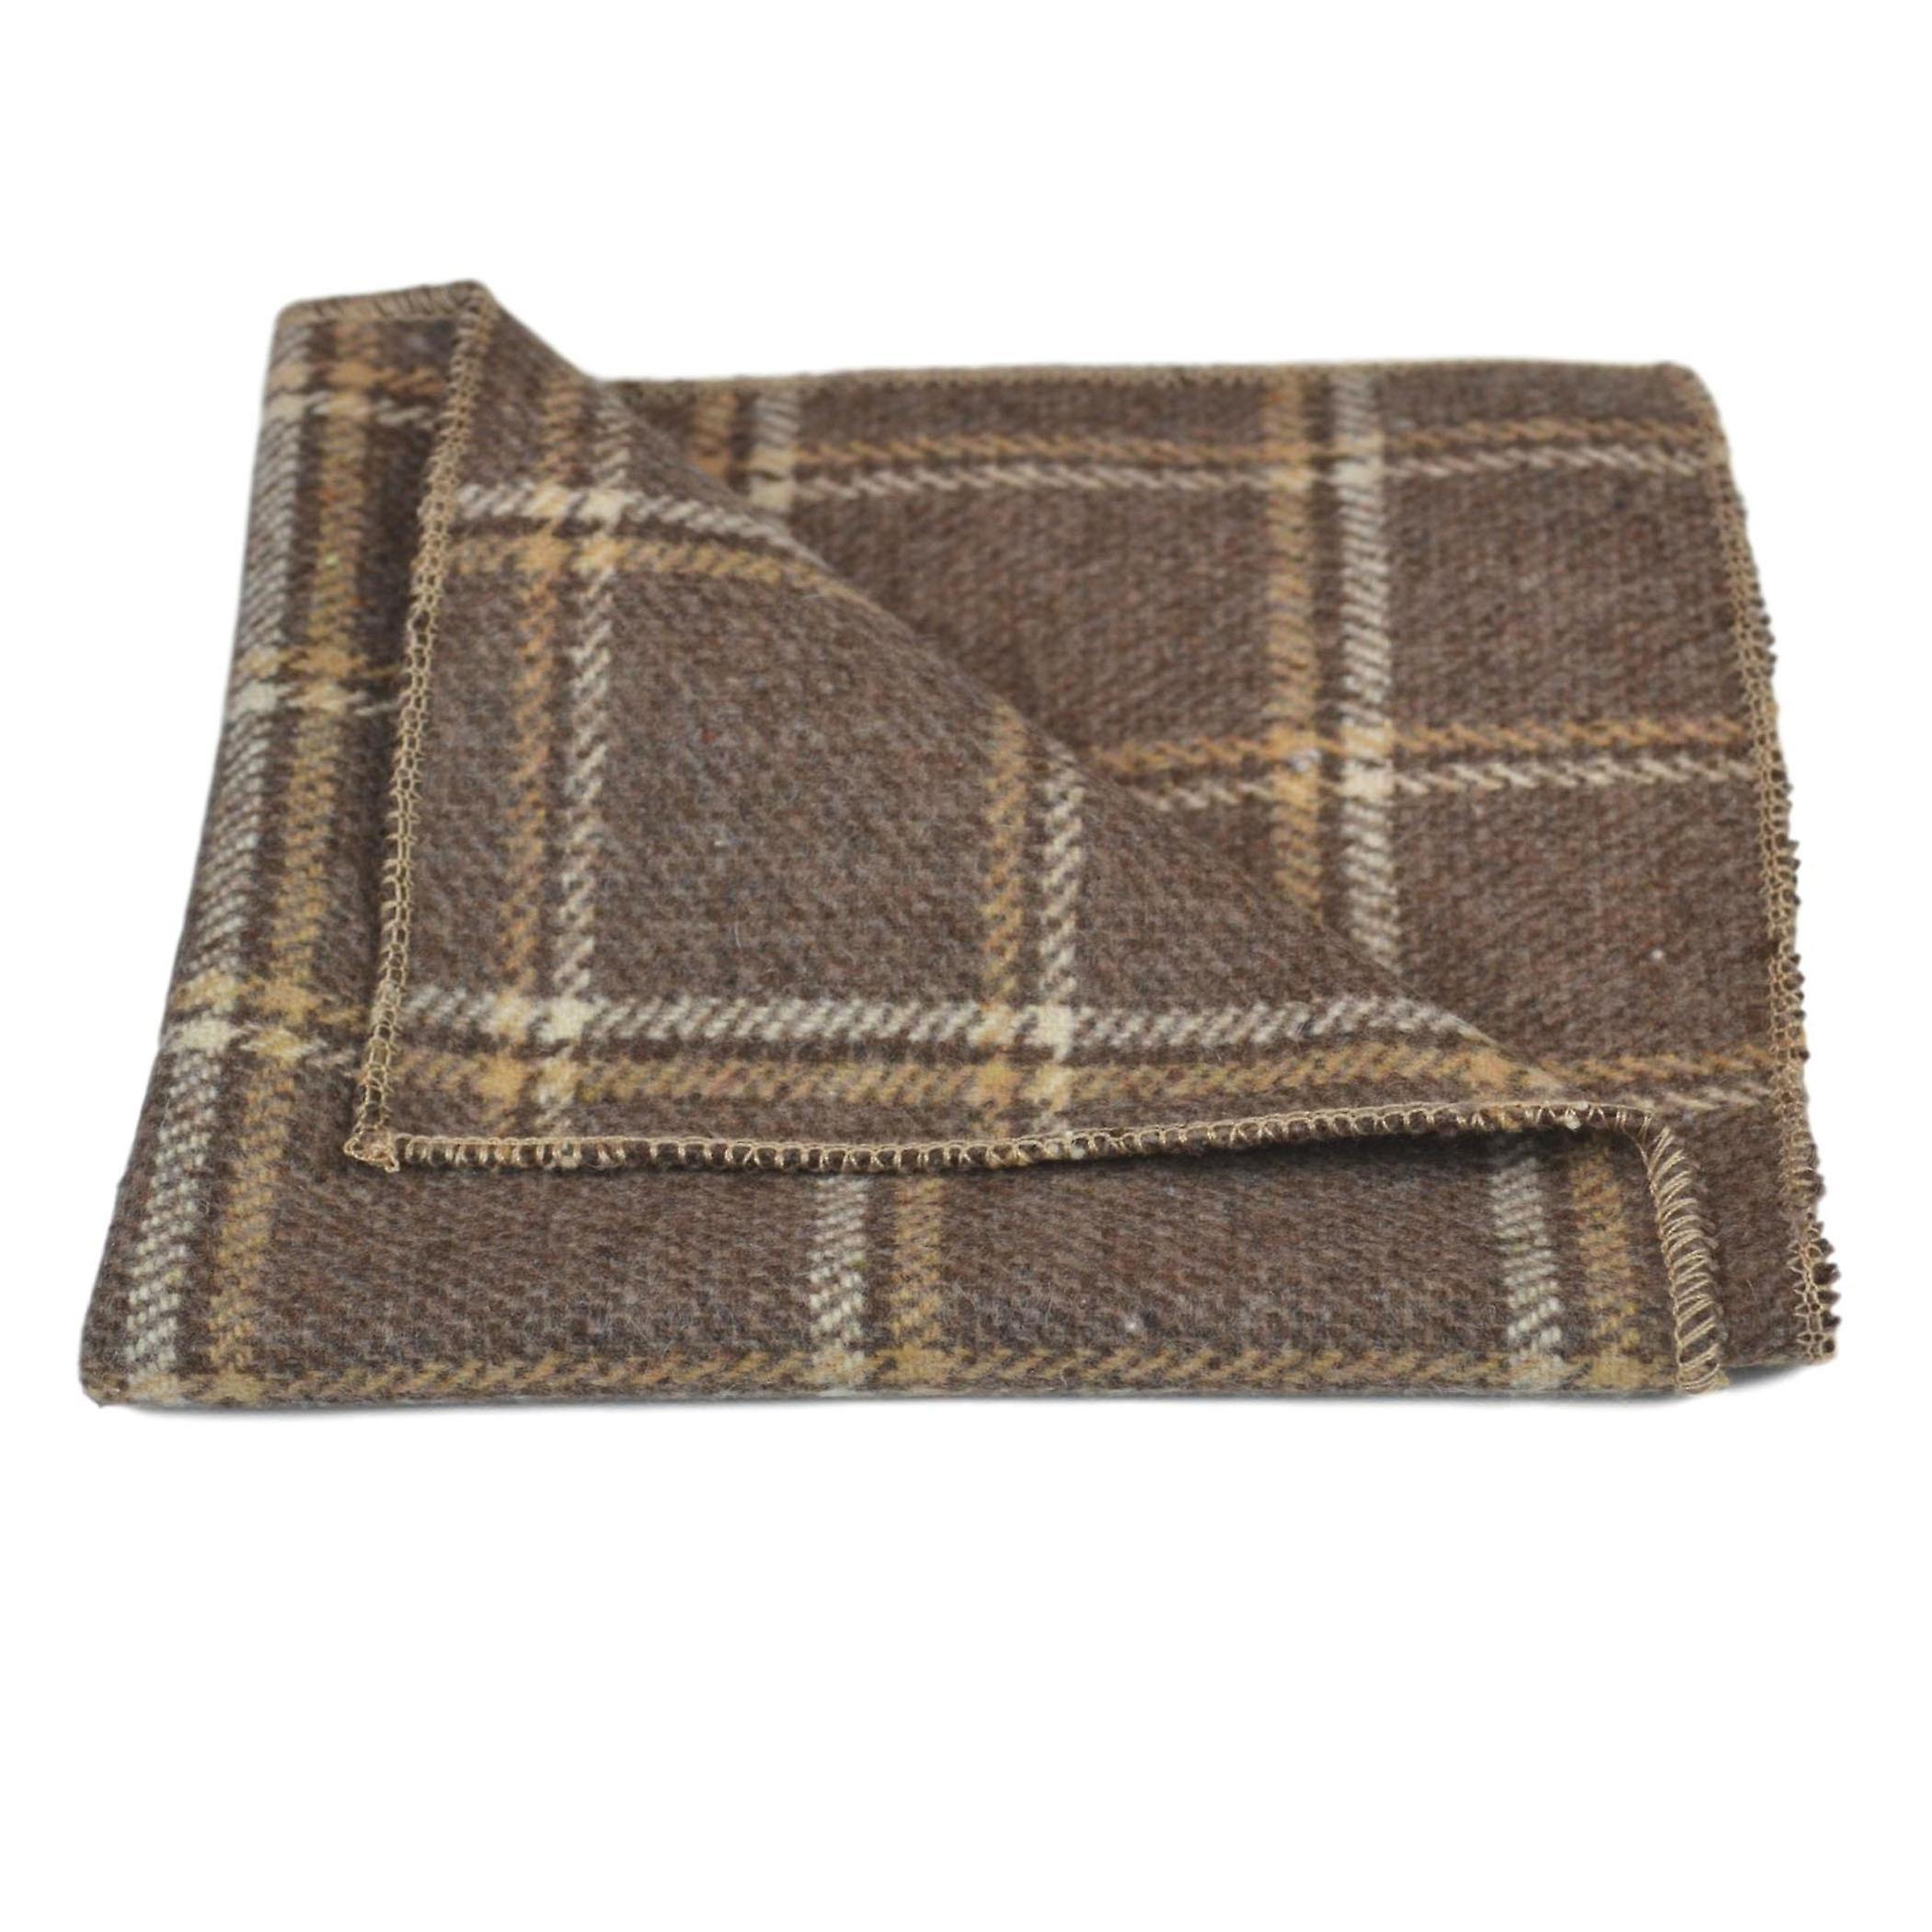 Heritage Pecan Brown Check Tie & Pocket Square Set